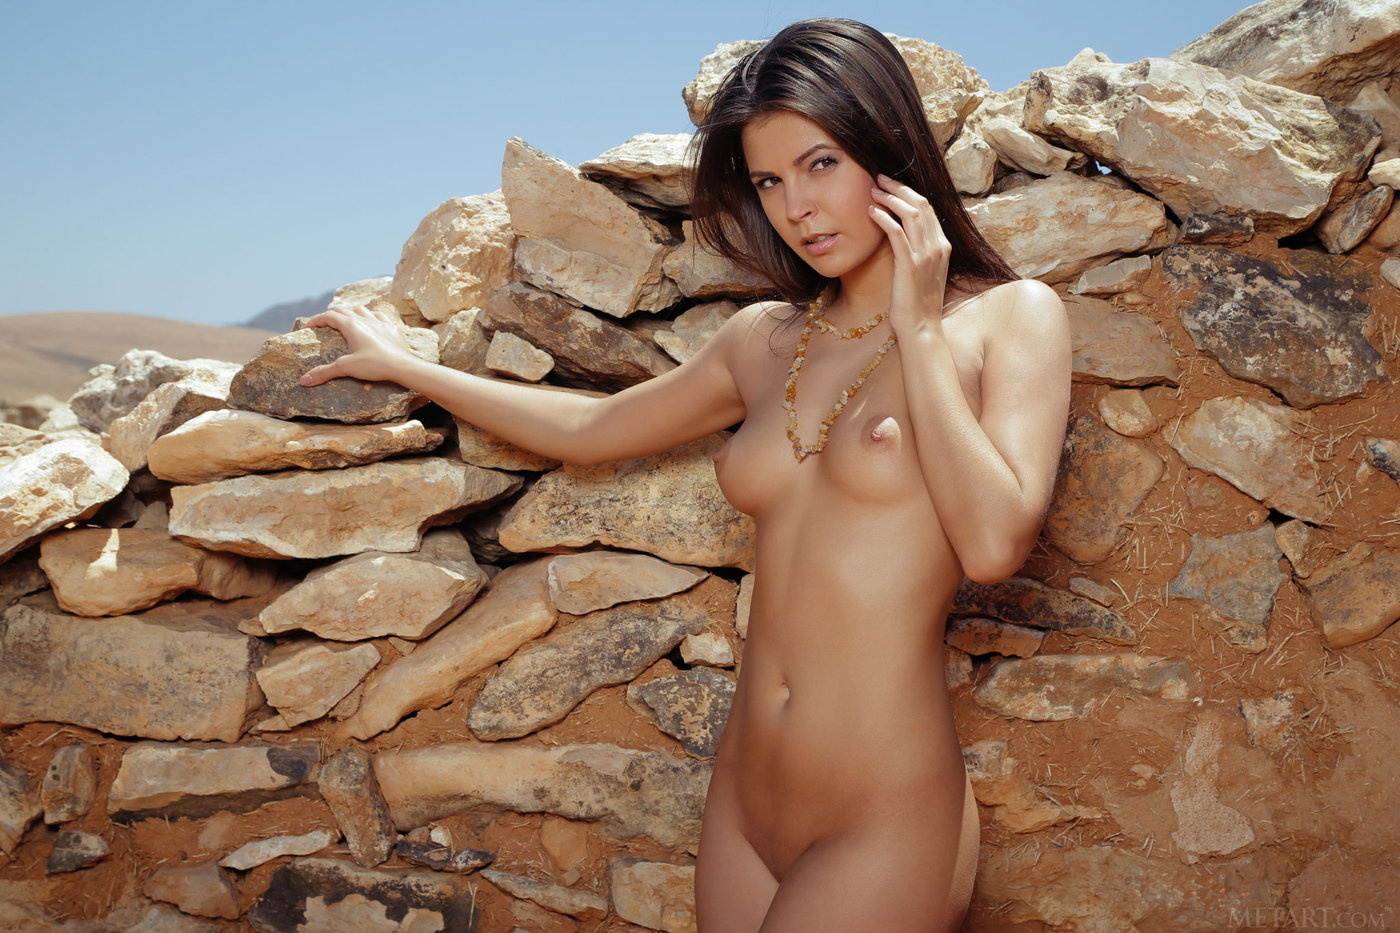 Free Naked Girls Psp Themes